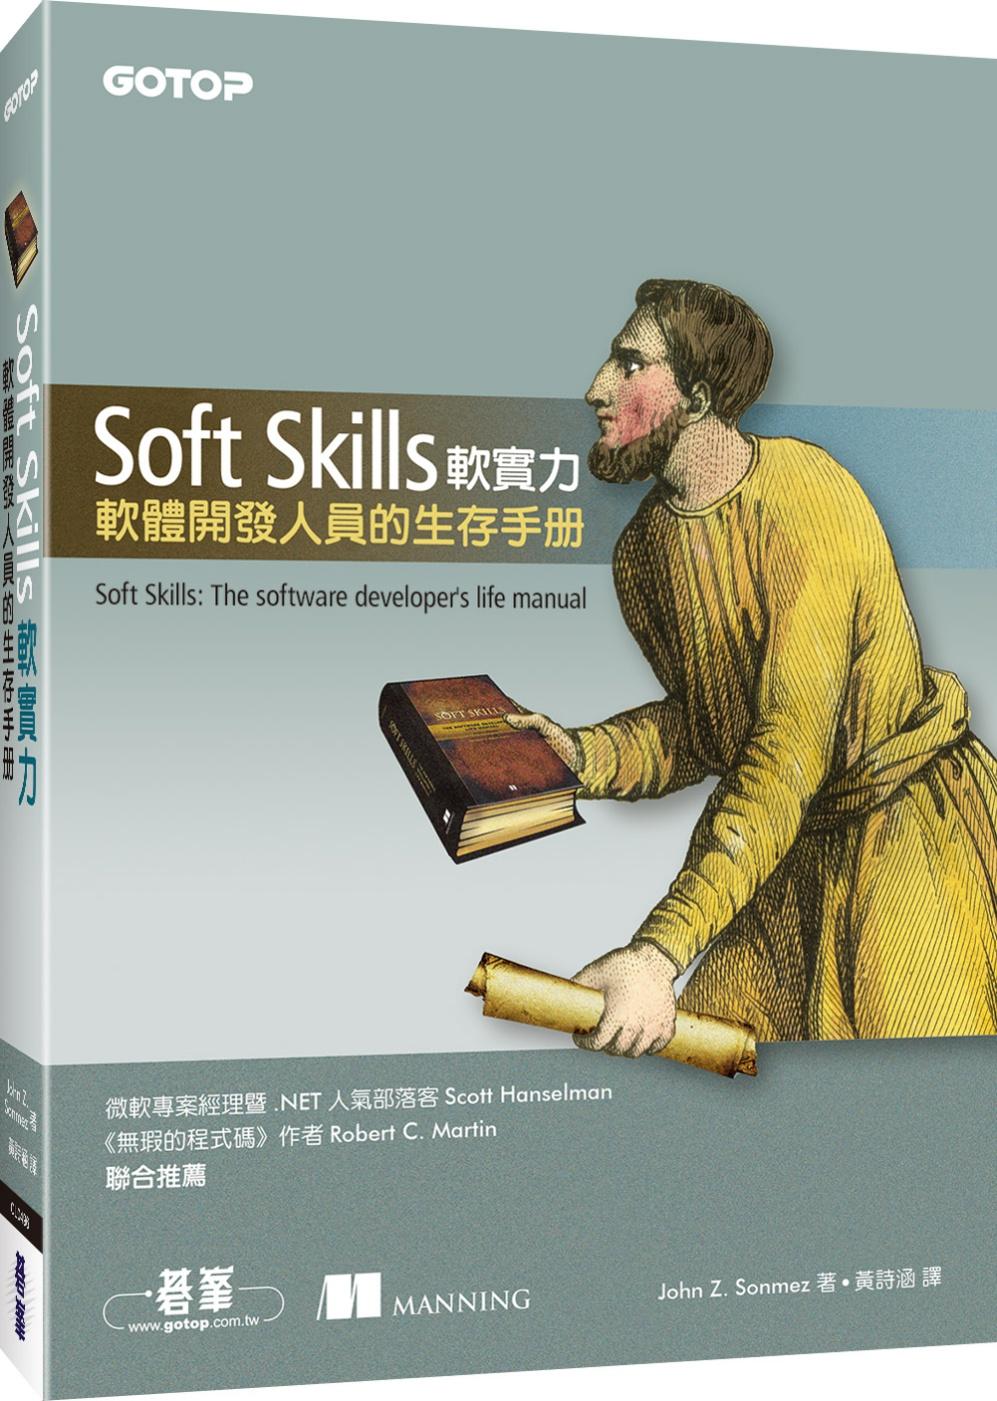 Soft Skills 軟實力:軟體開發人員的生存手冊